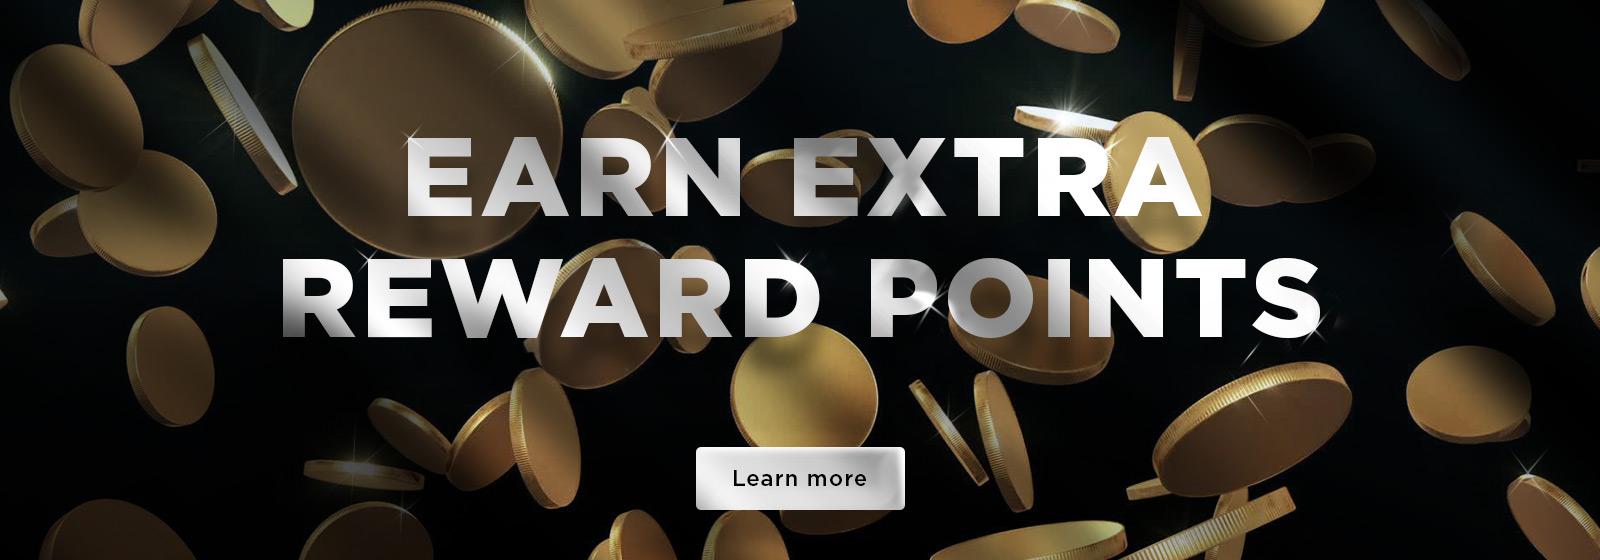 Earn Extra Reward Points